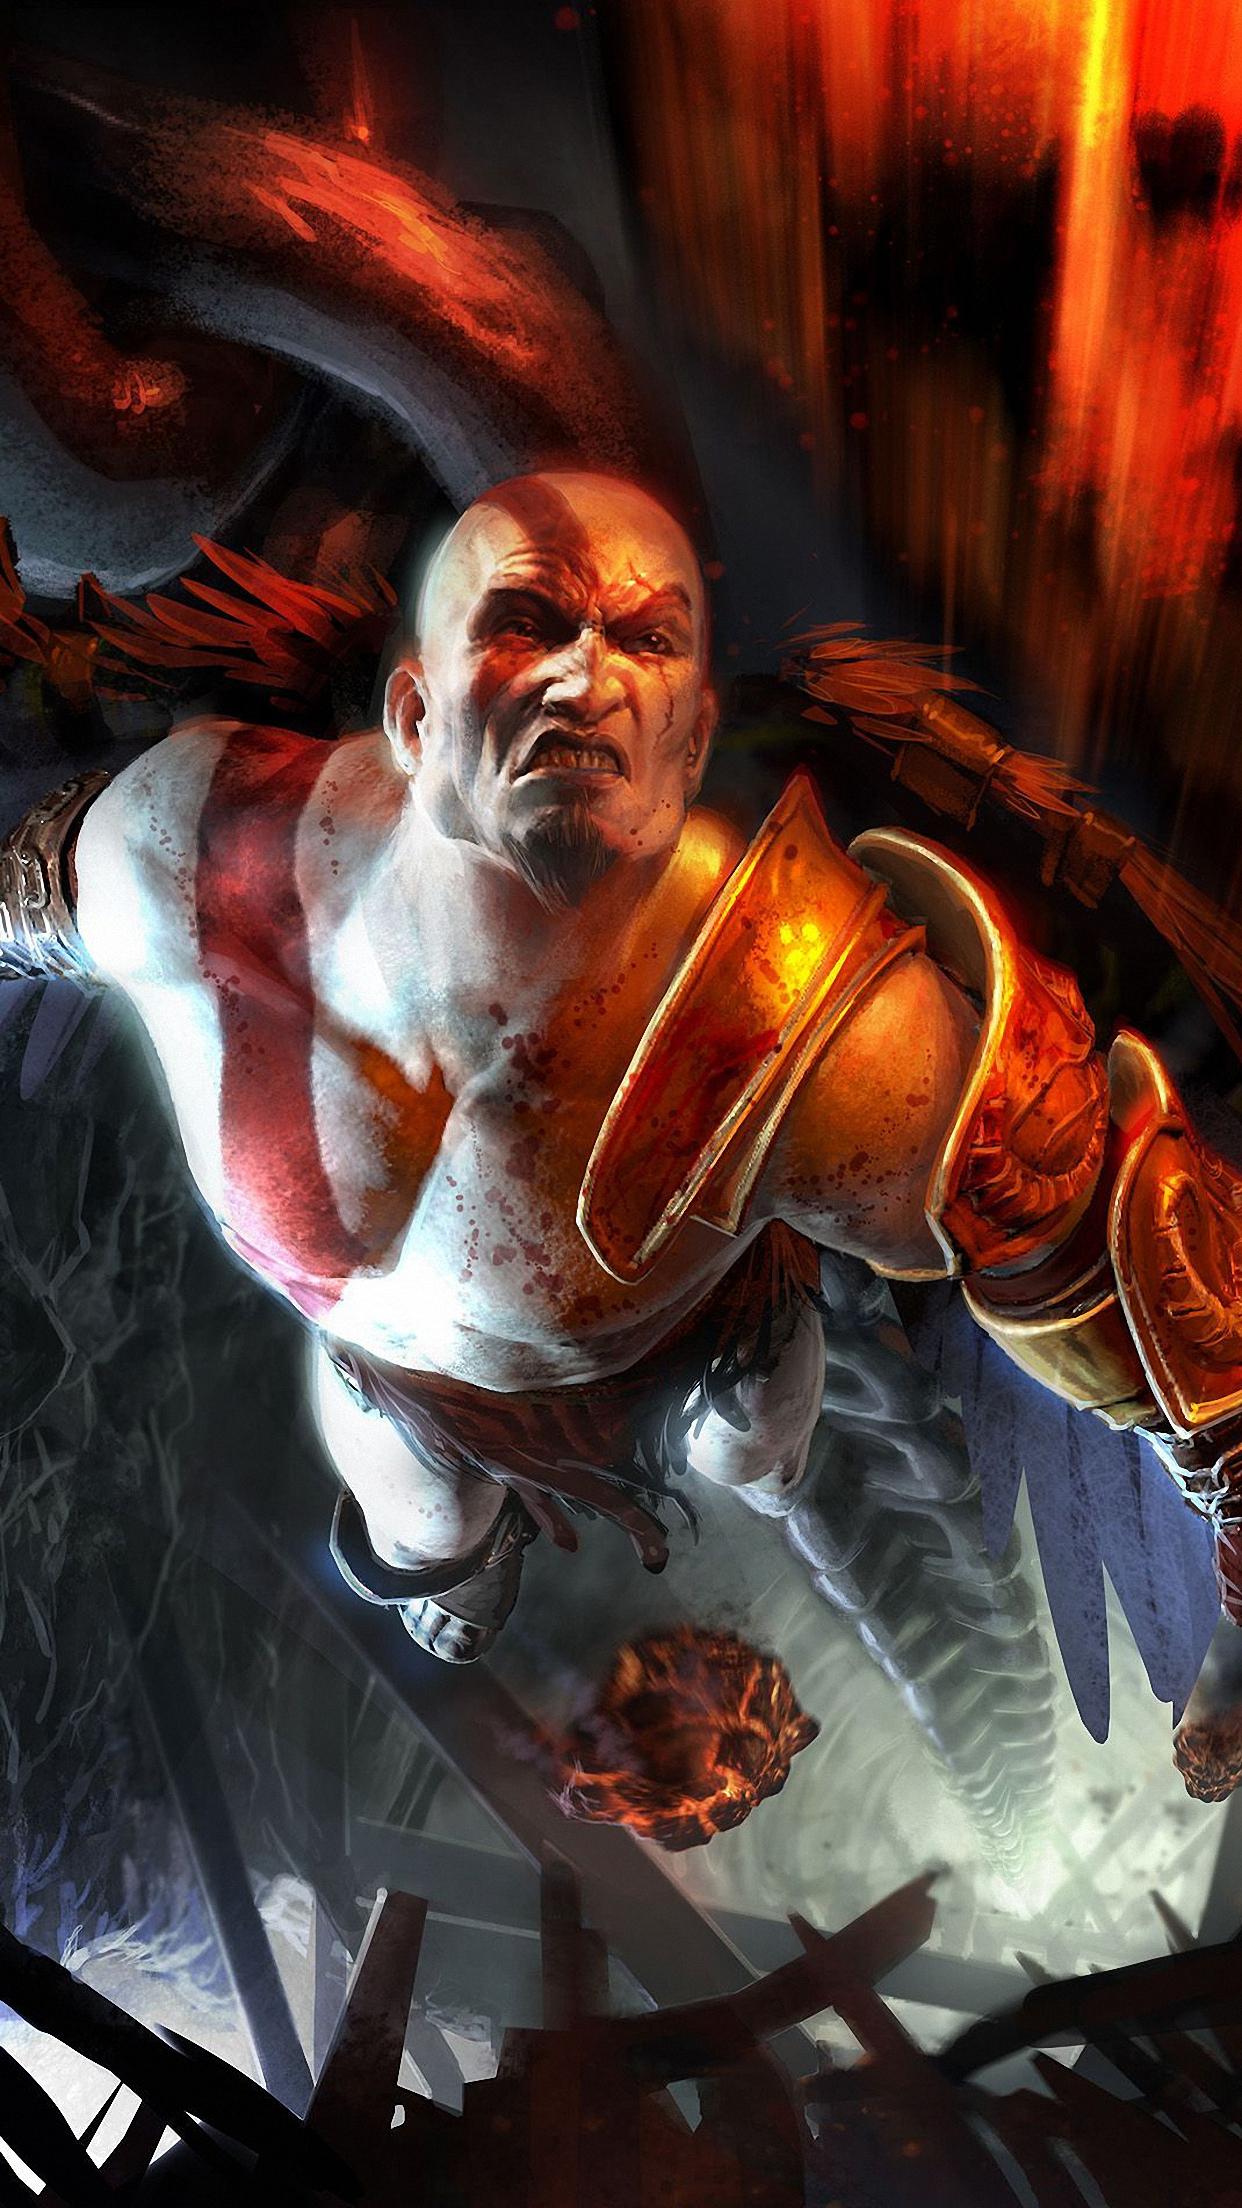 God Of War Kratos 2 Wallpaper For Iphone X 8 7 6 Free